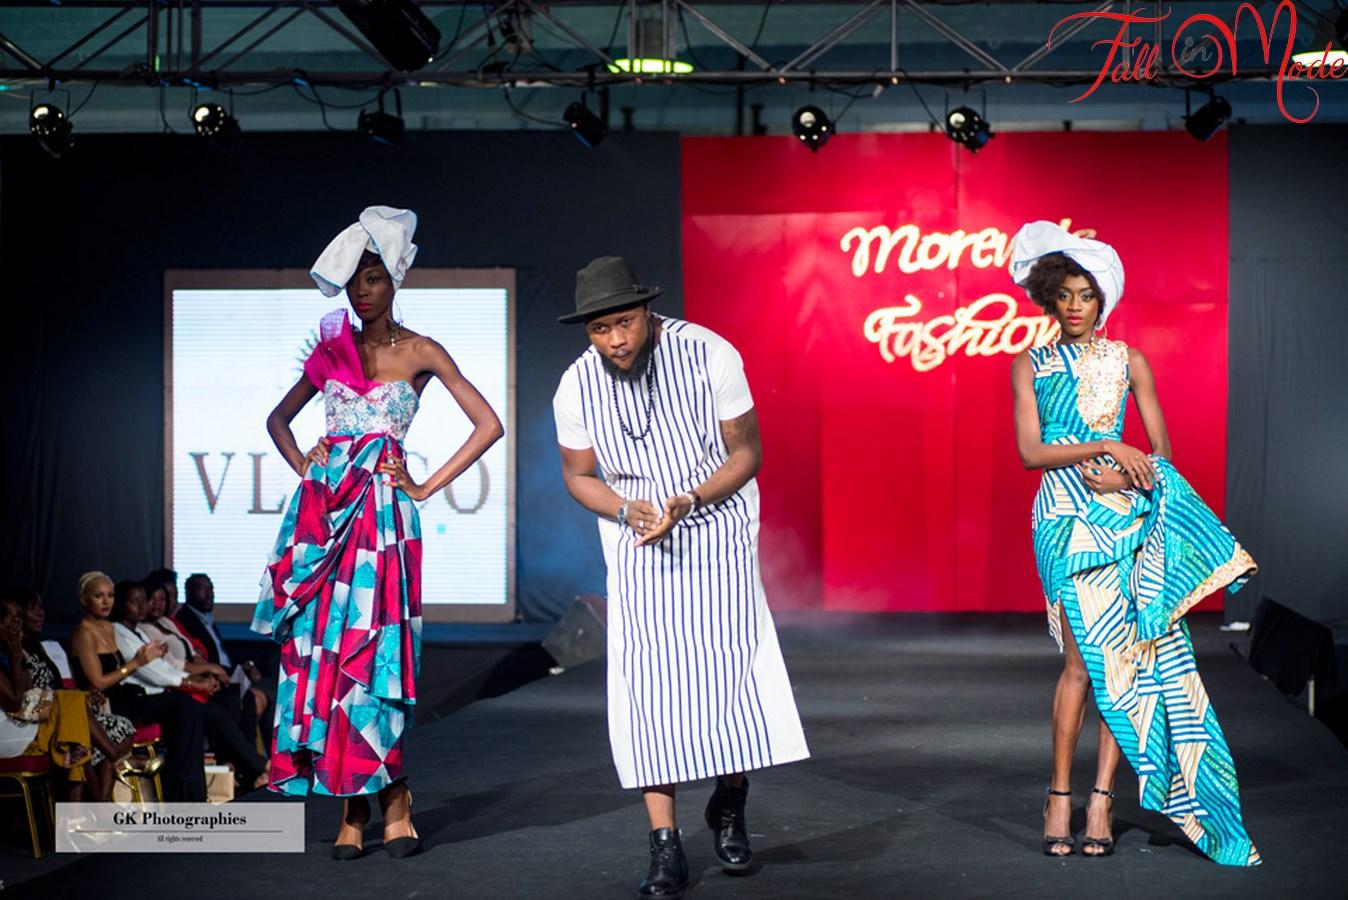 moreno's fashion_vlisco_amenan_tanoh_fantastyck_fanta_koné_blogueuses_ivoiriennes_reotra